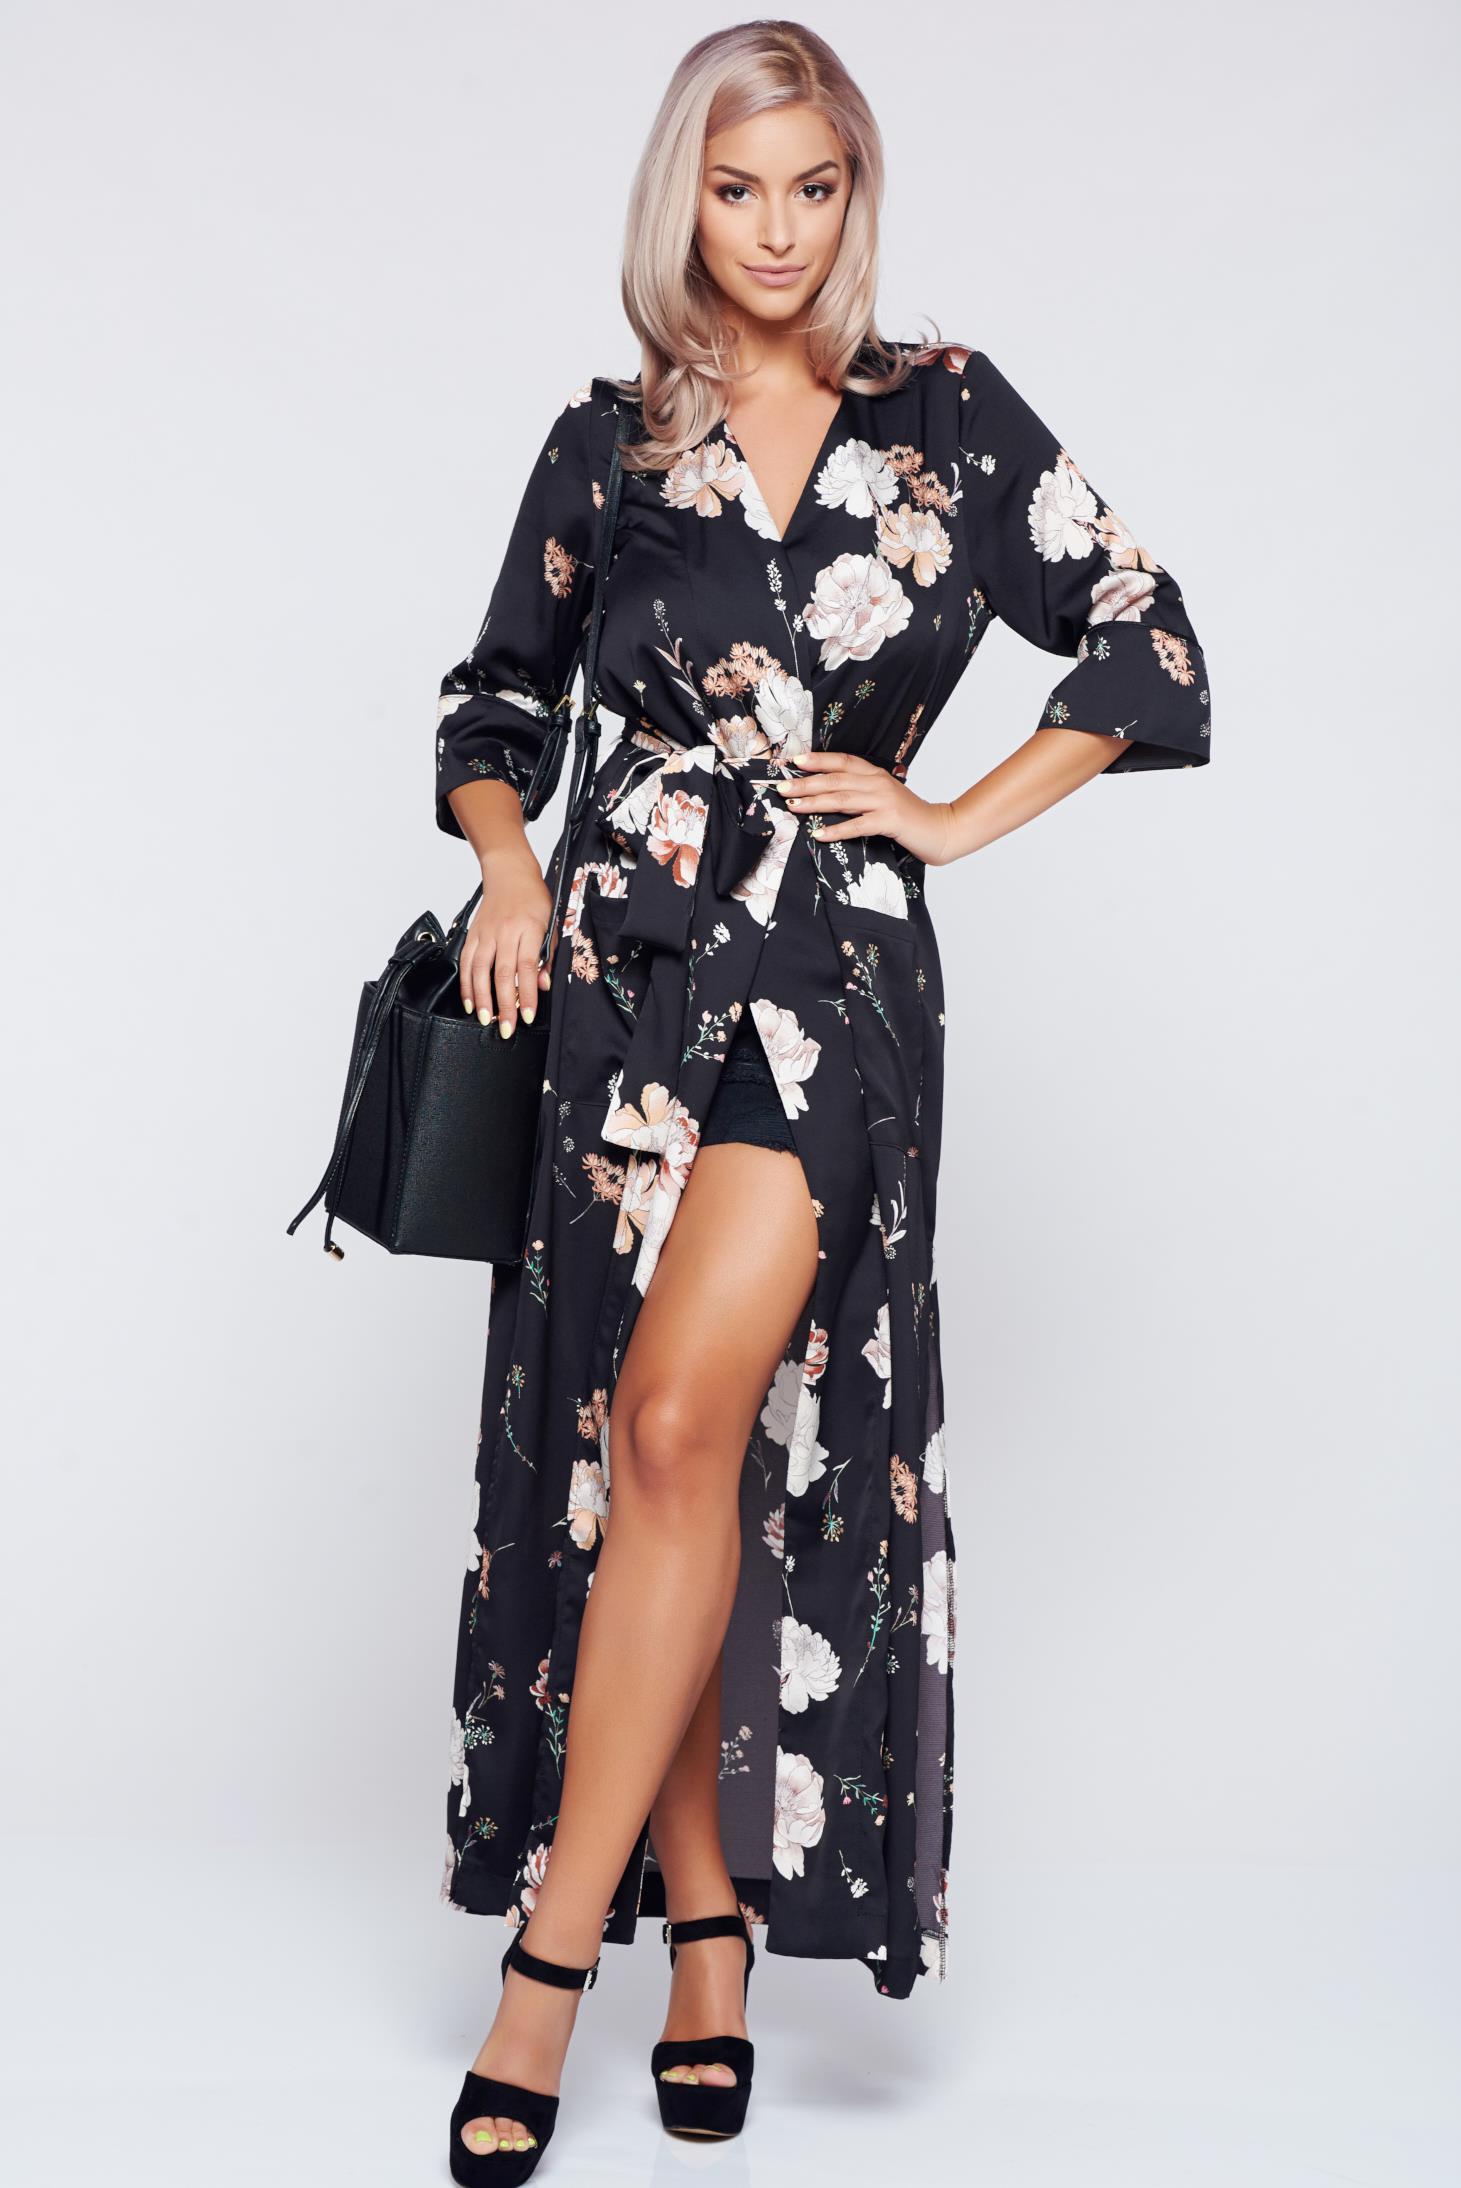 prettygirl black flared kimono dress accessorized with tied waistband